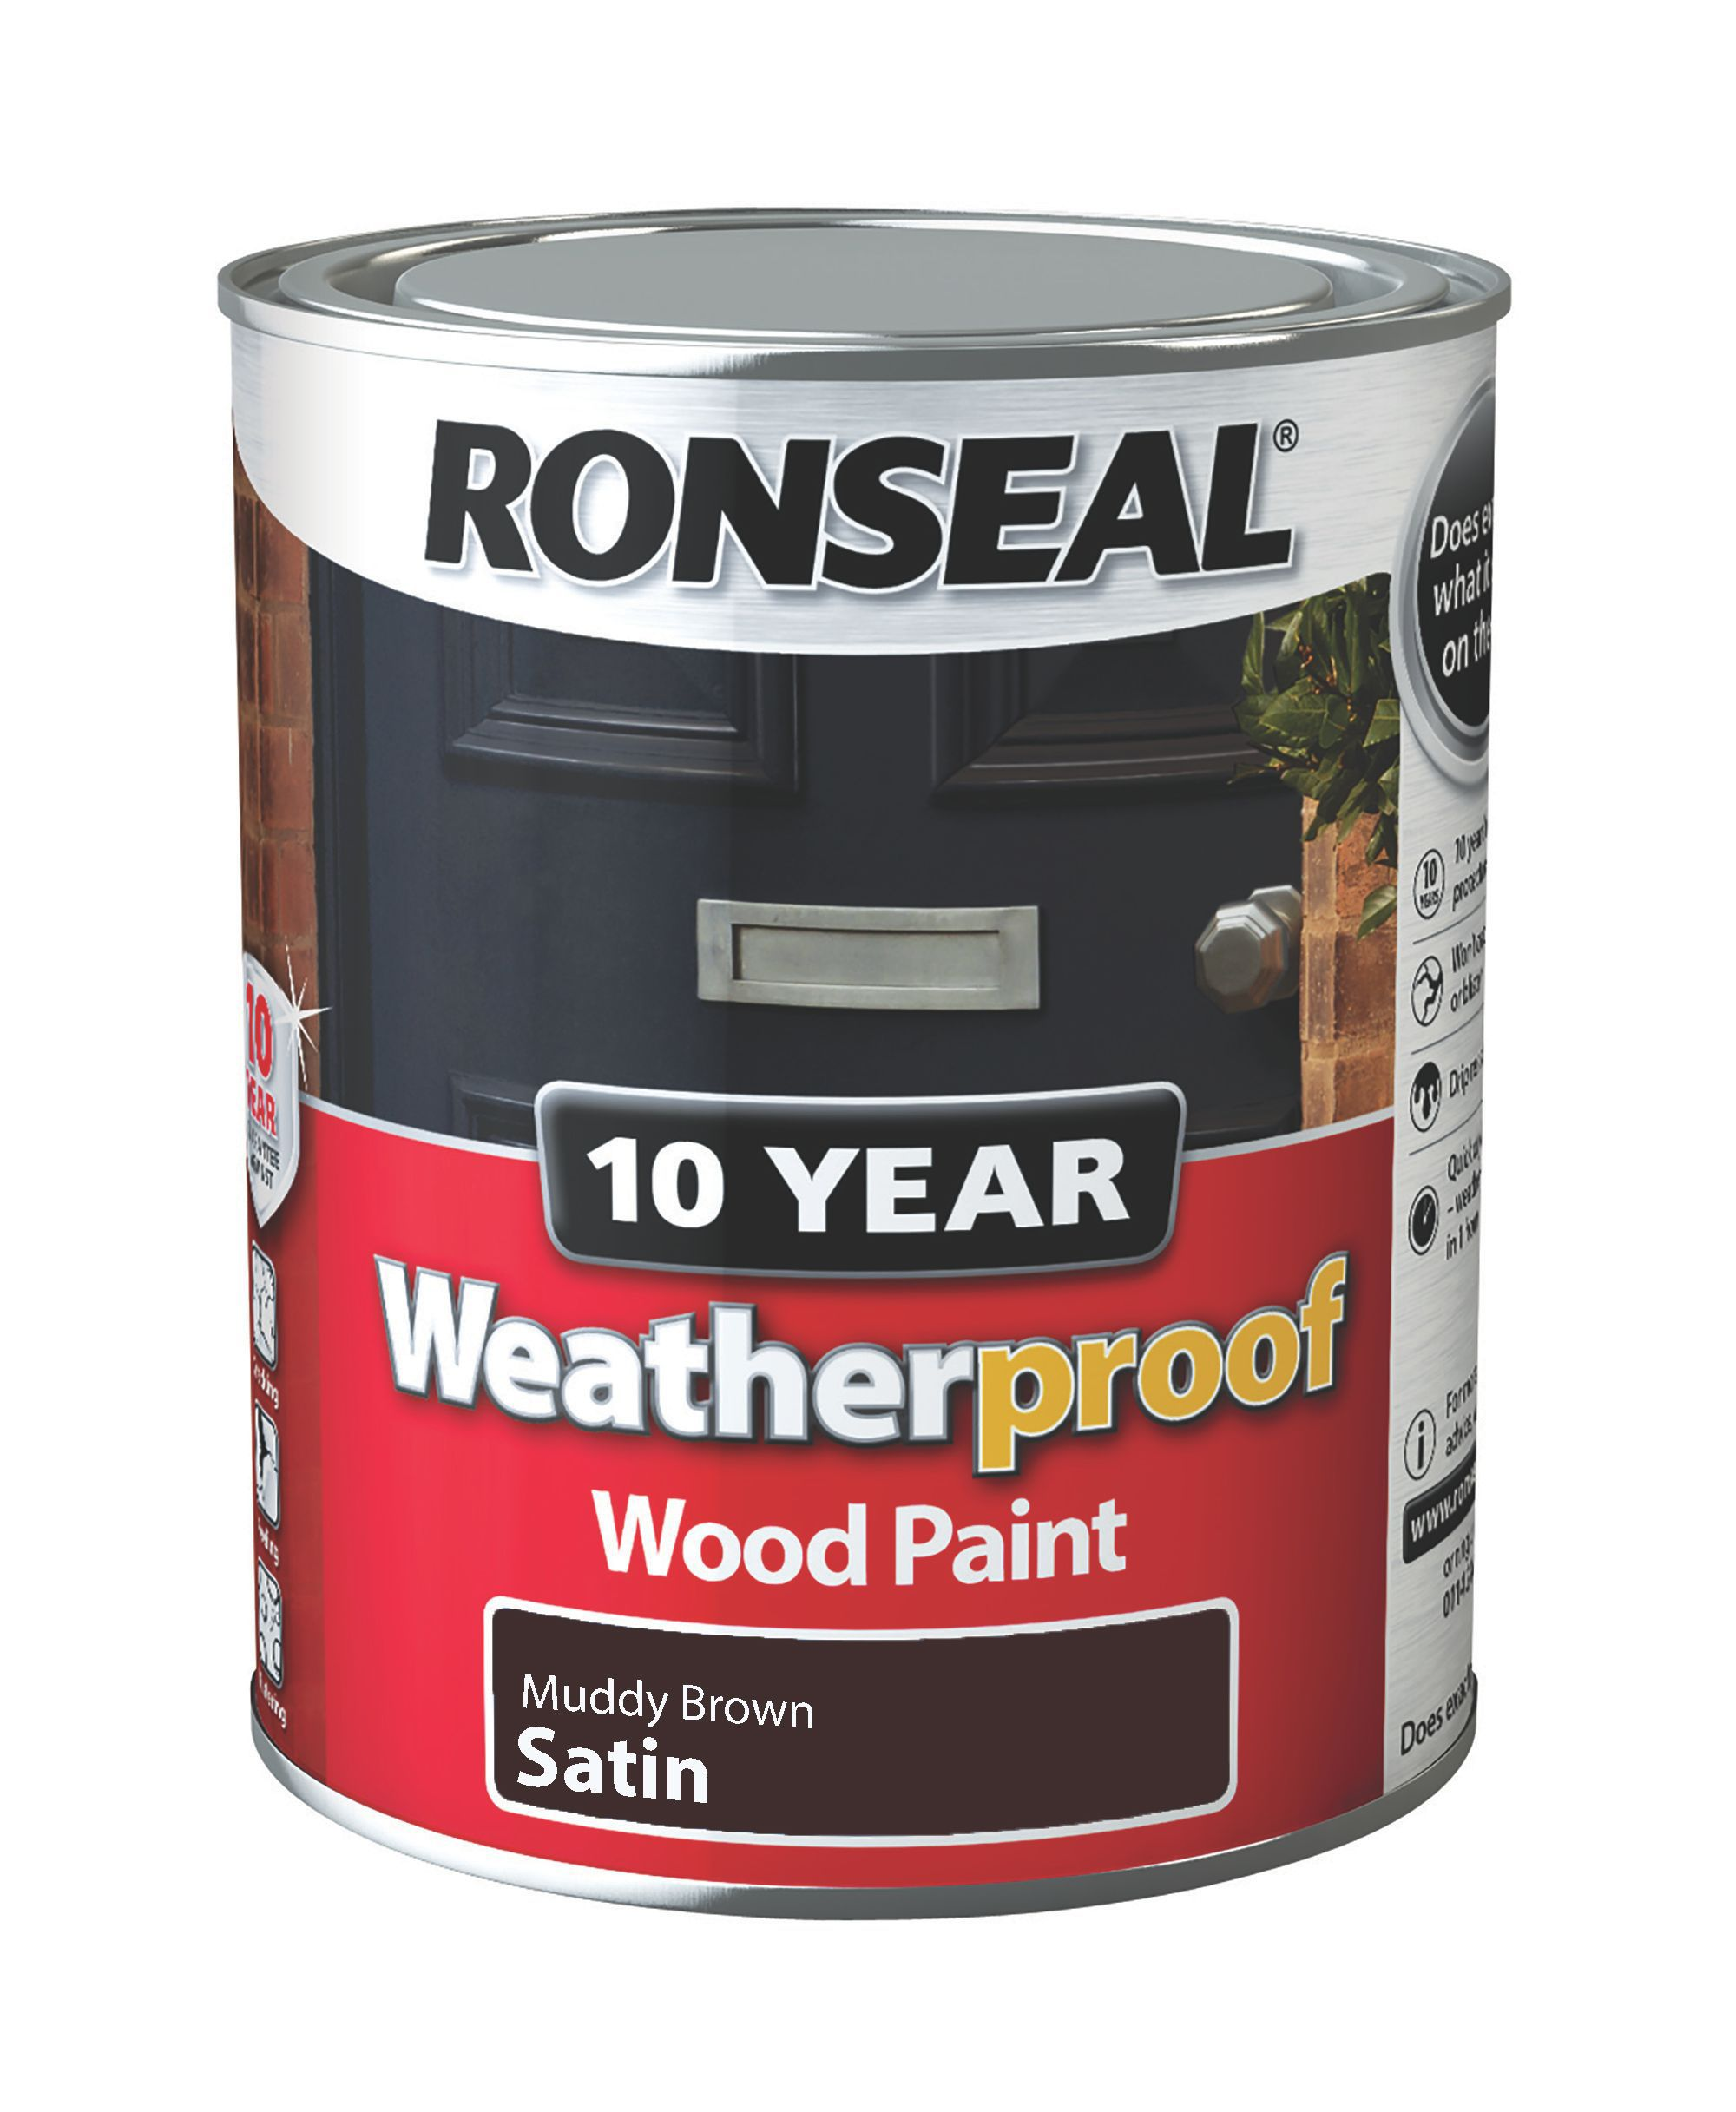 Ronseal Muddy Brown Satin Wood Paint